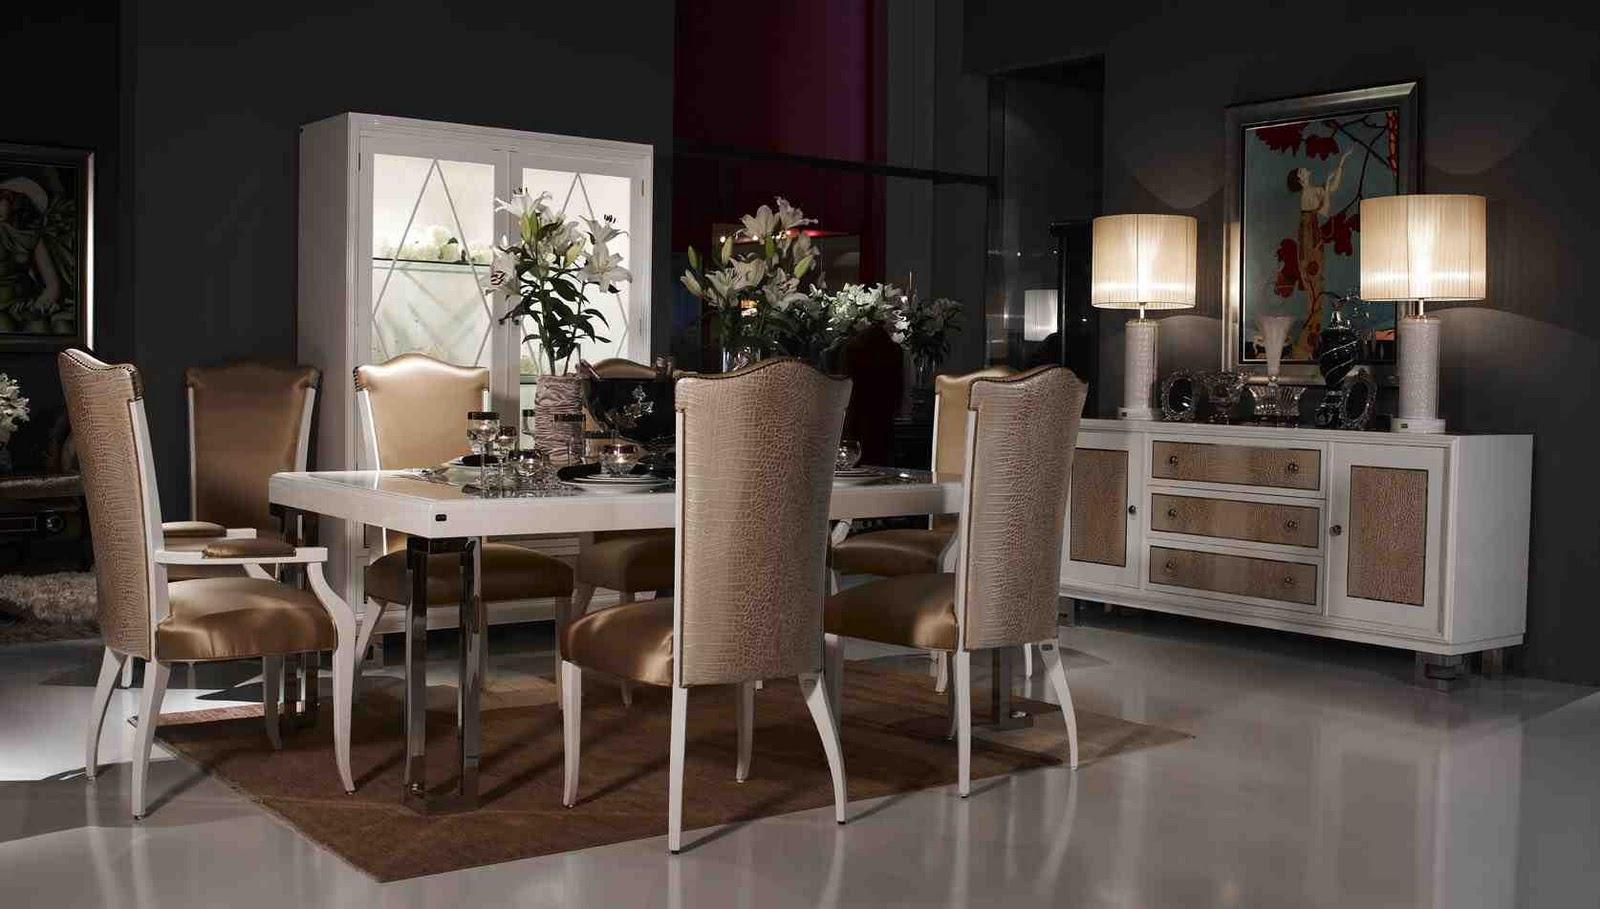 Furniture Design Services For Interior Design